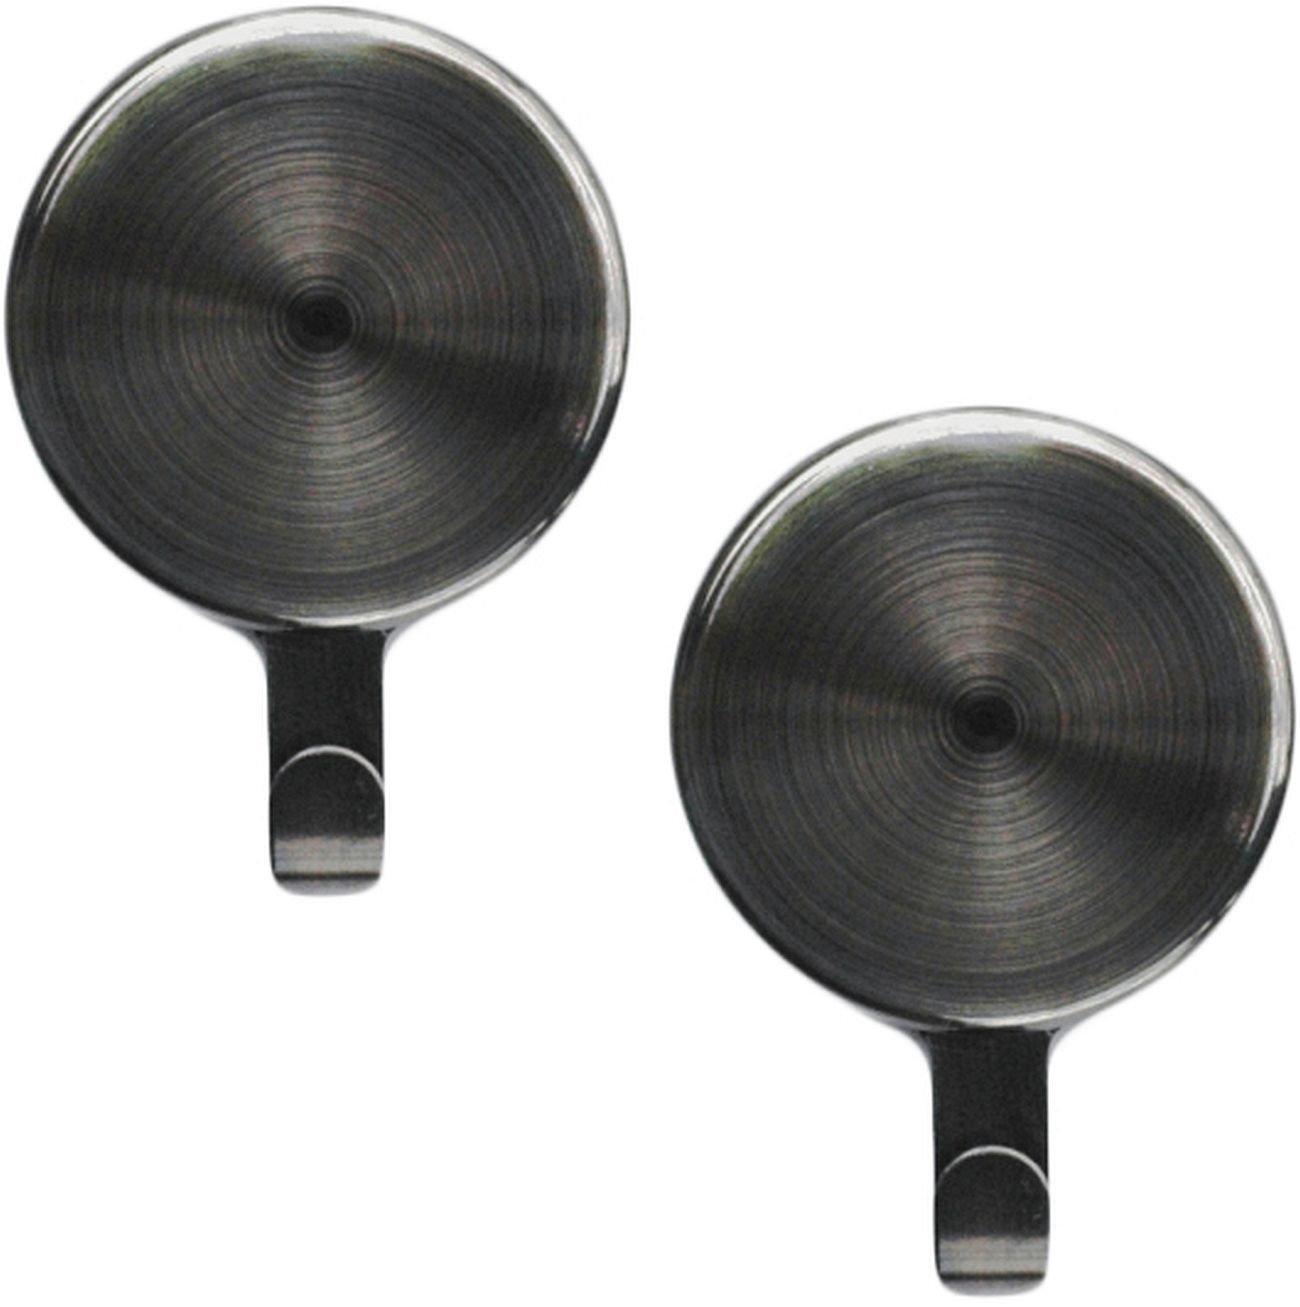 Attract(TM) Magnetic Wreath Hanger  2-Pack, Brushed Nickel